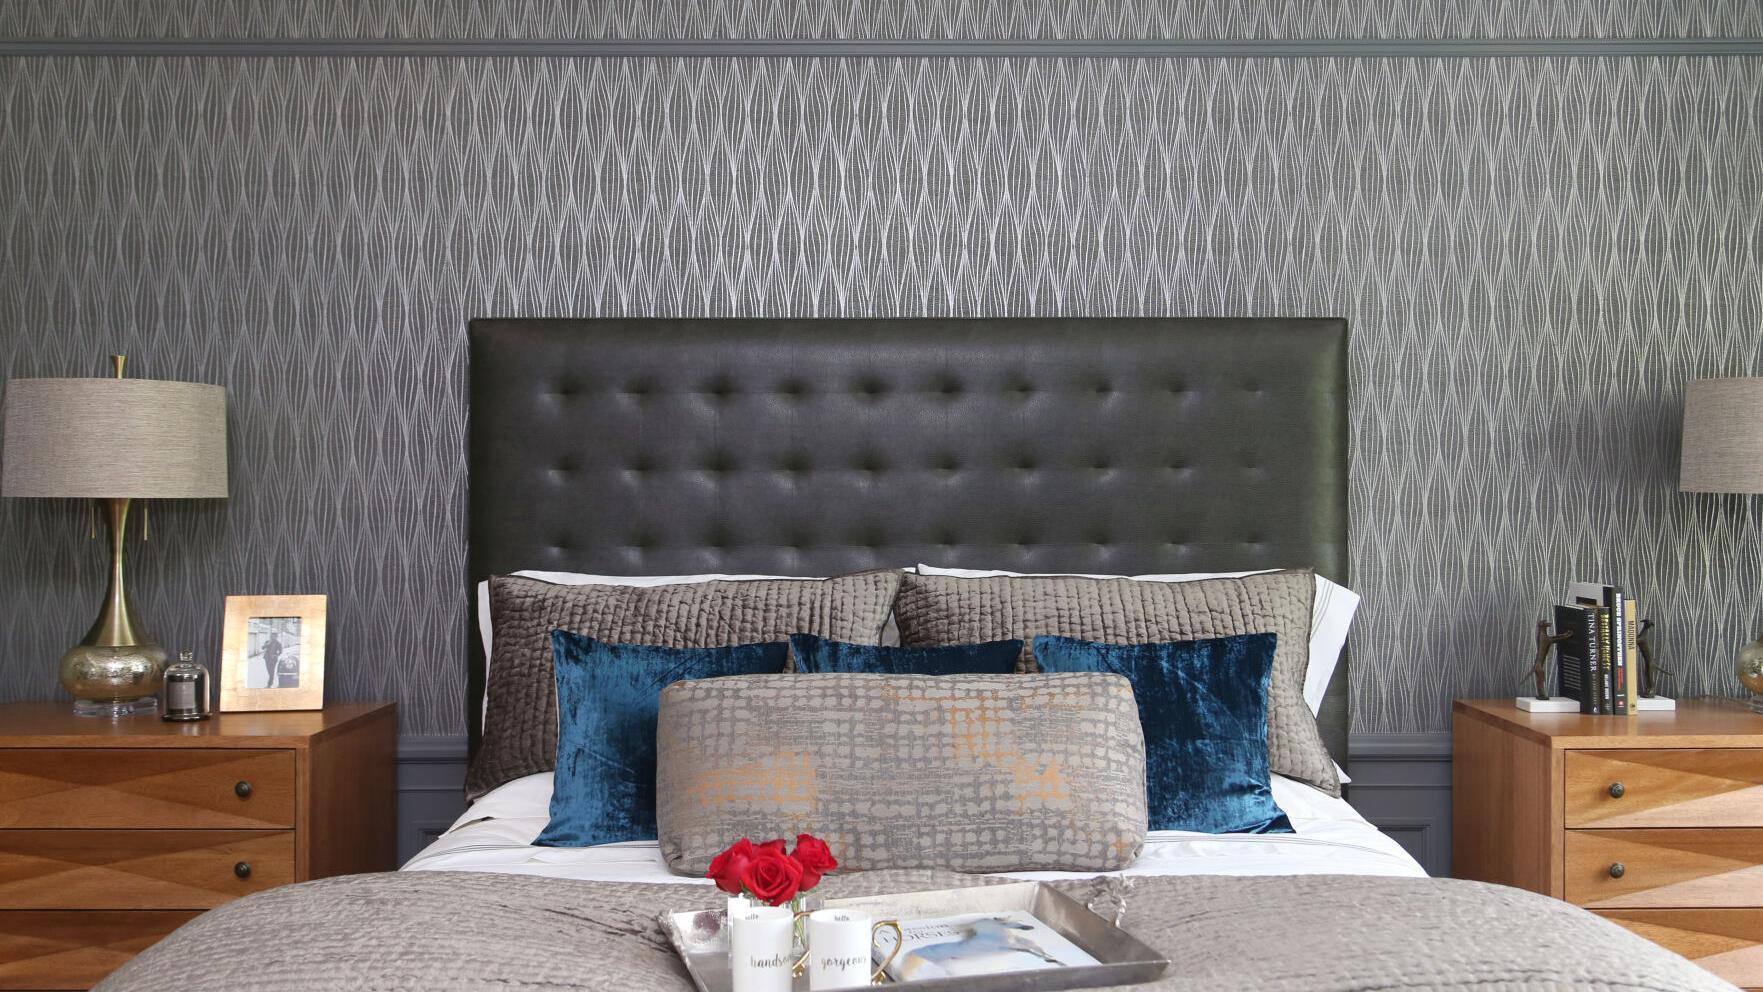 Wallpaper makes a comeback as homeowners favor fresh, custom style